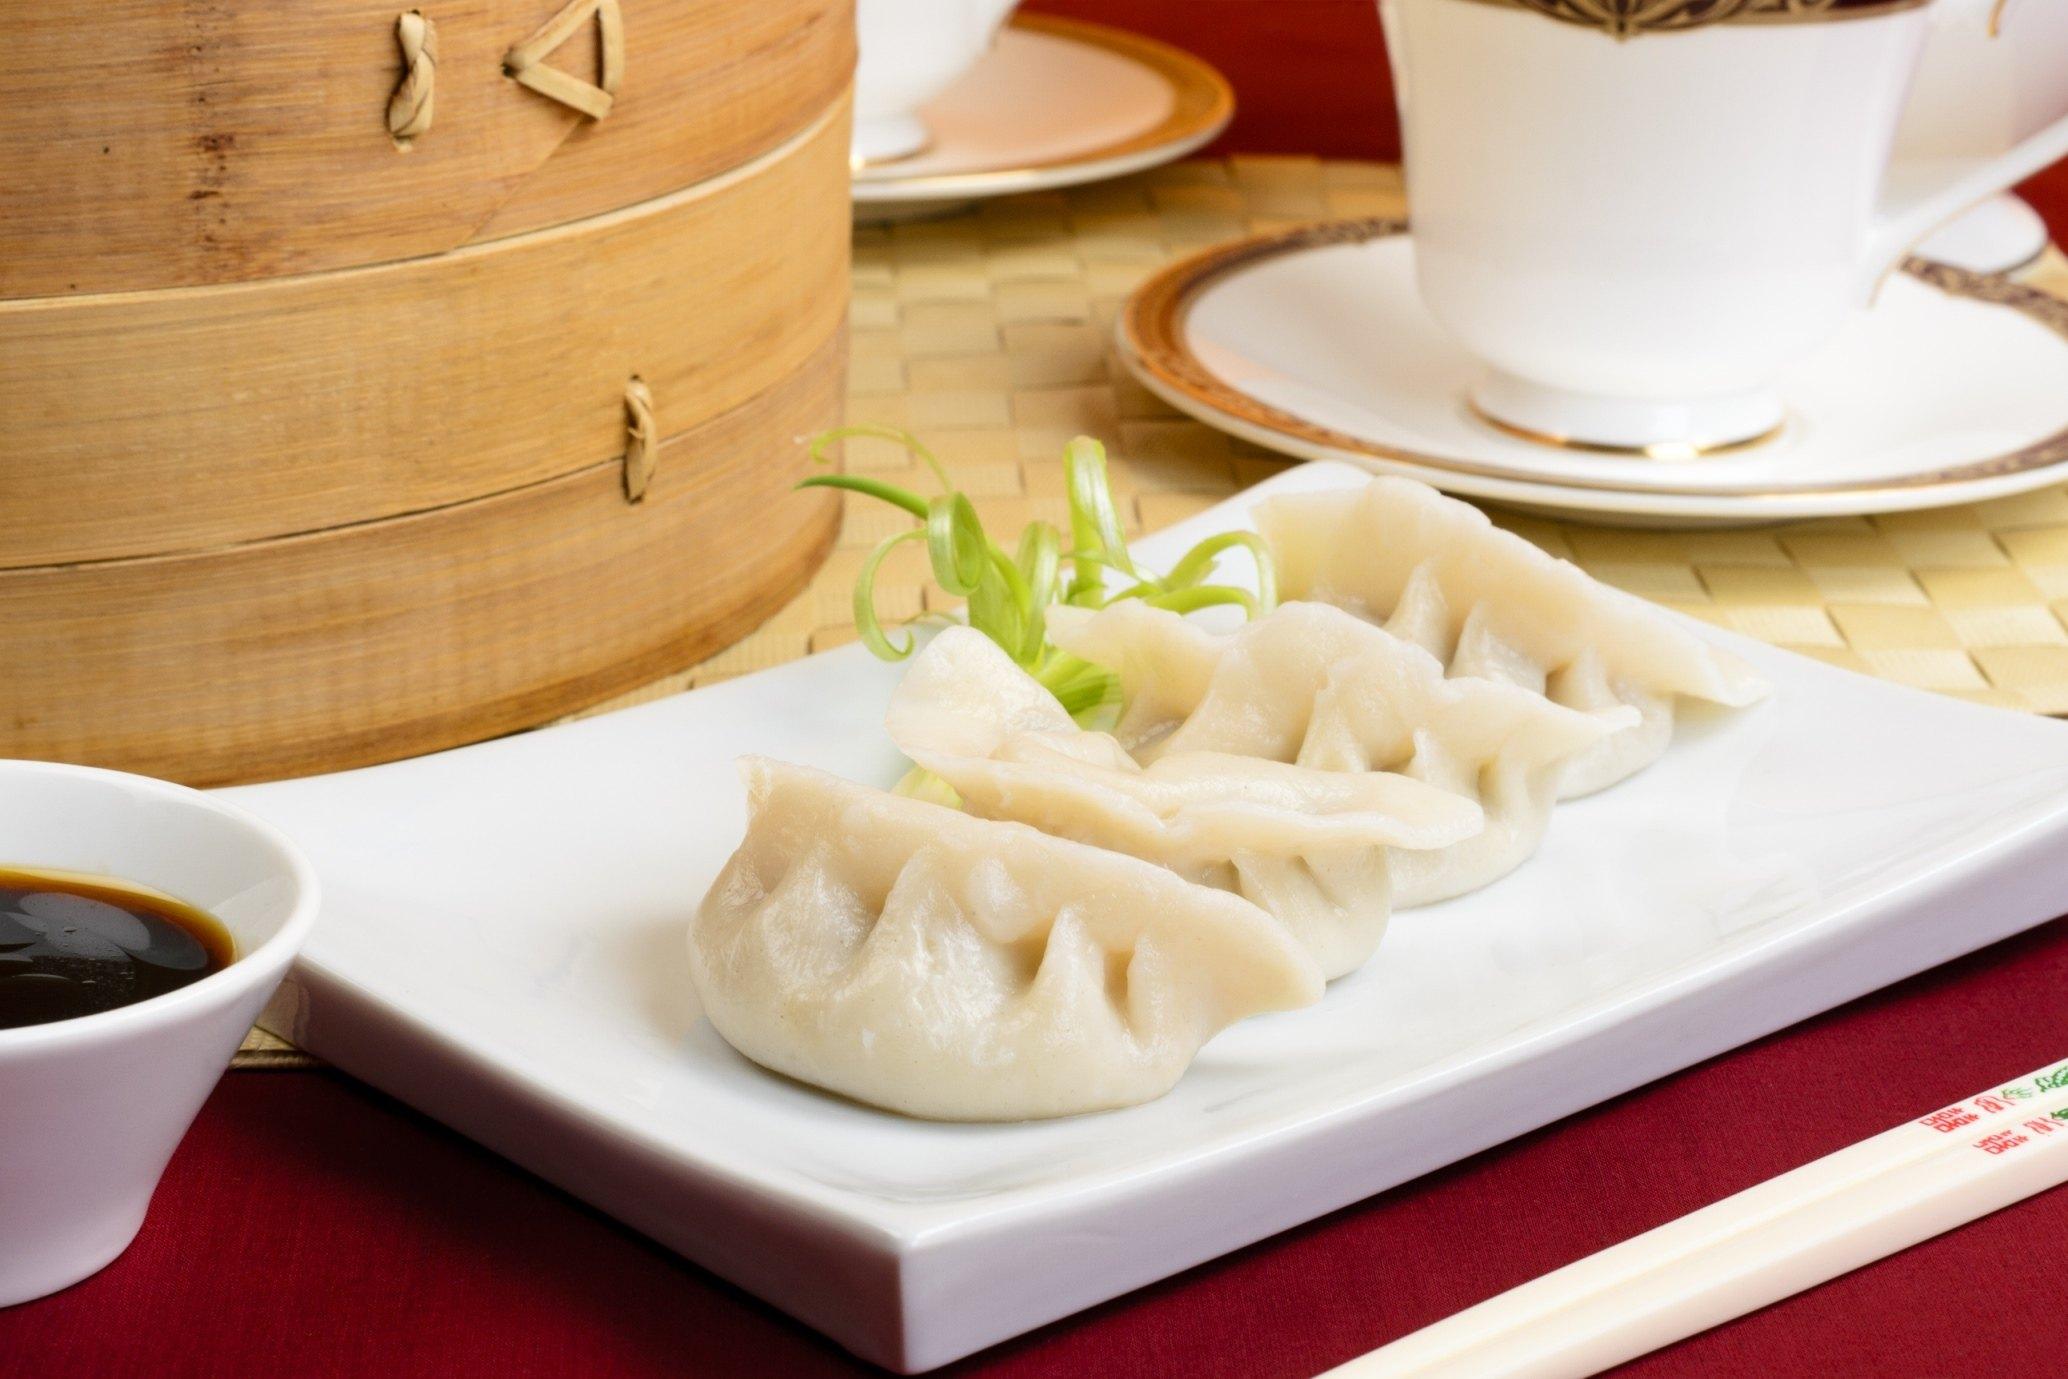 Ravioli al vapore ricetta classica cinese agrodolce for Ricette cucina cinese